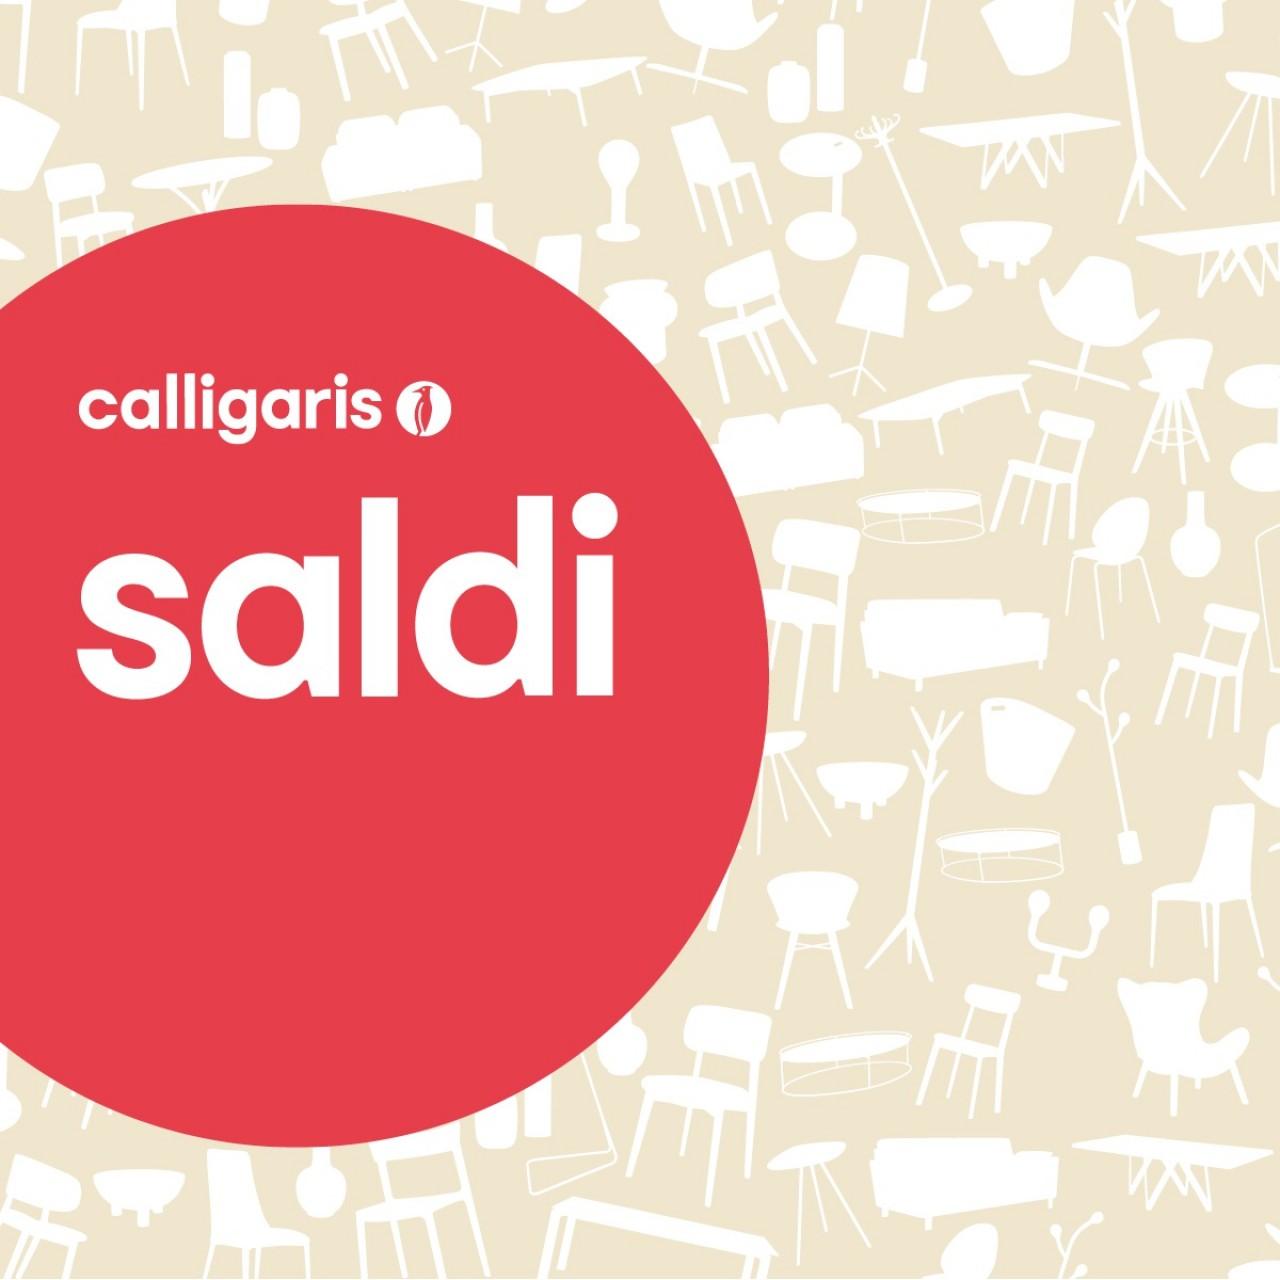 Saldi Mobili Torino.Saldi Calligaris Offerte Mobili Torino Arredamenti Traiano